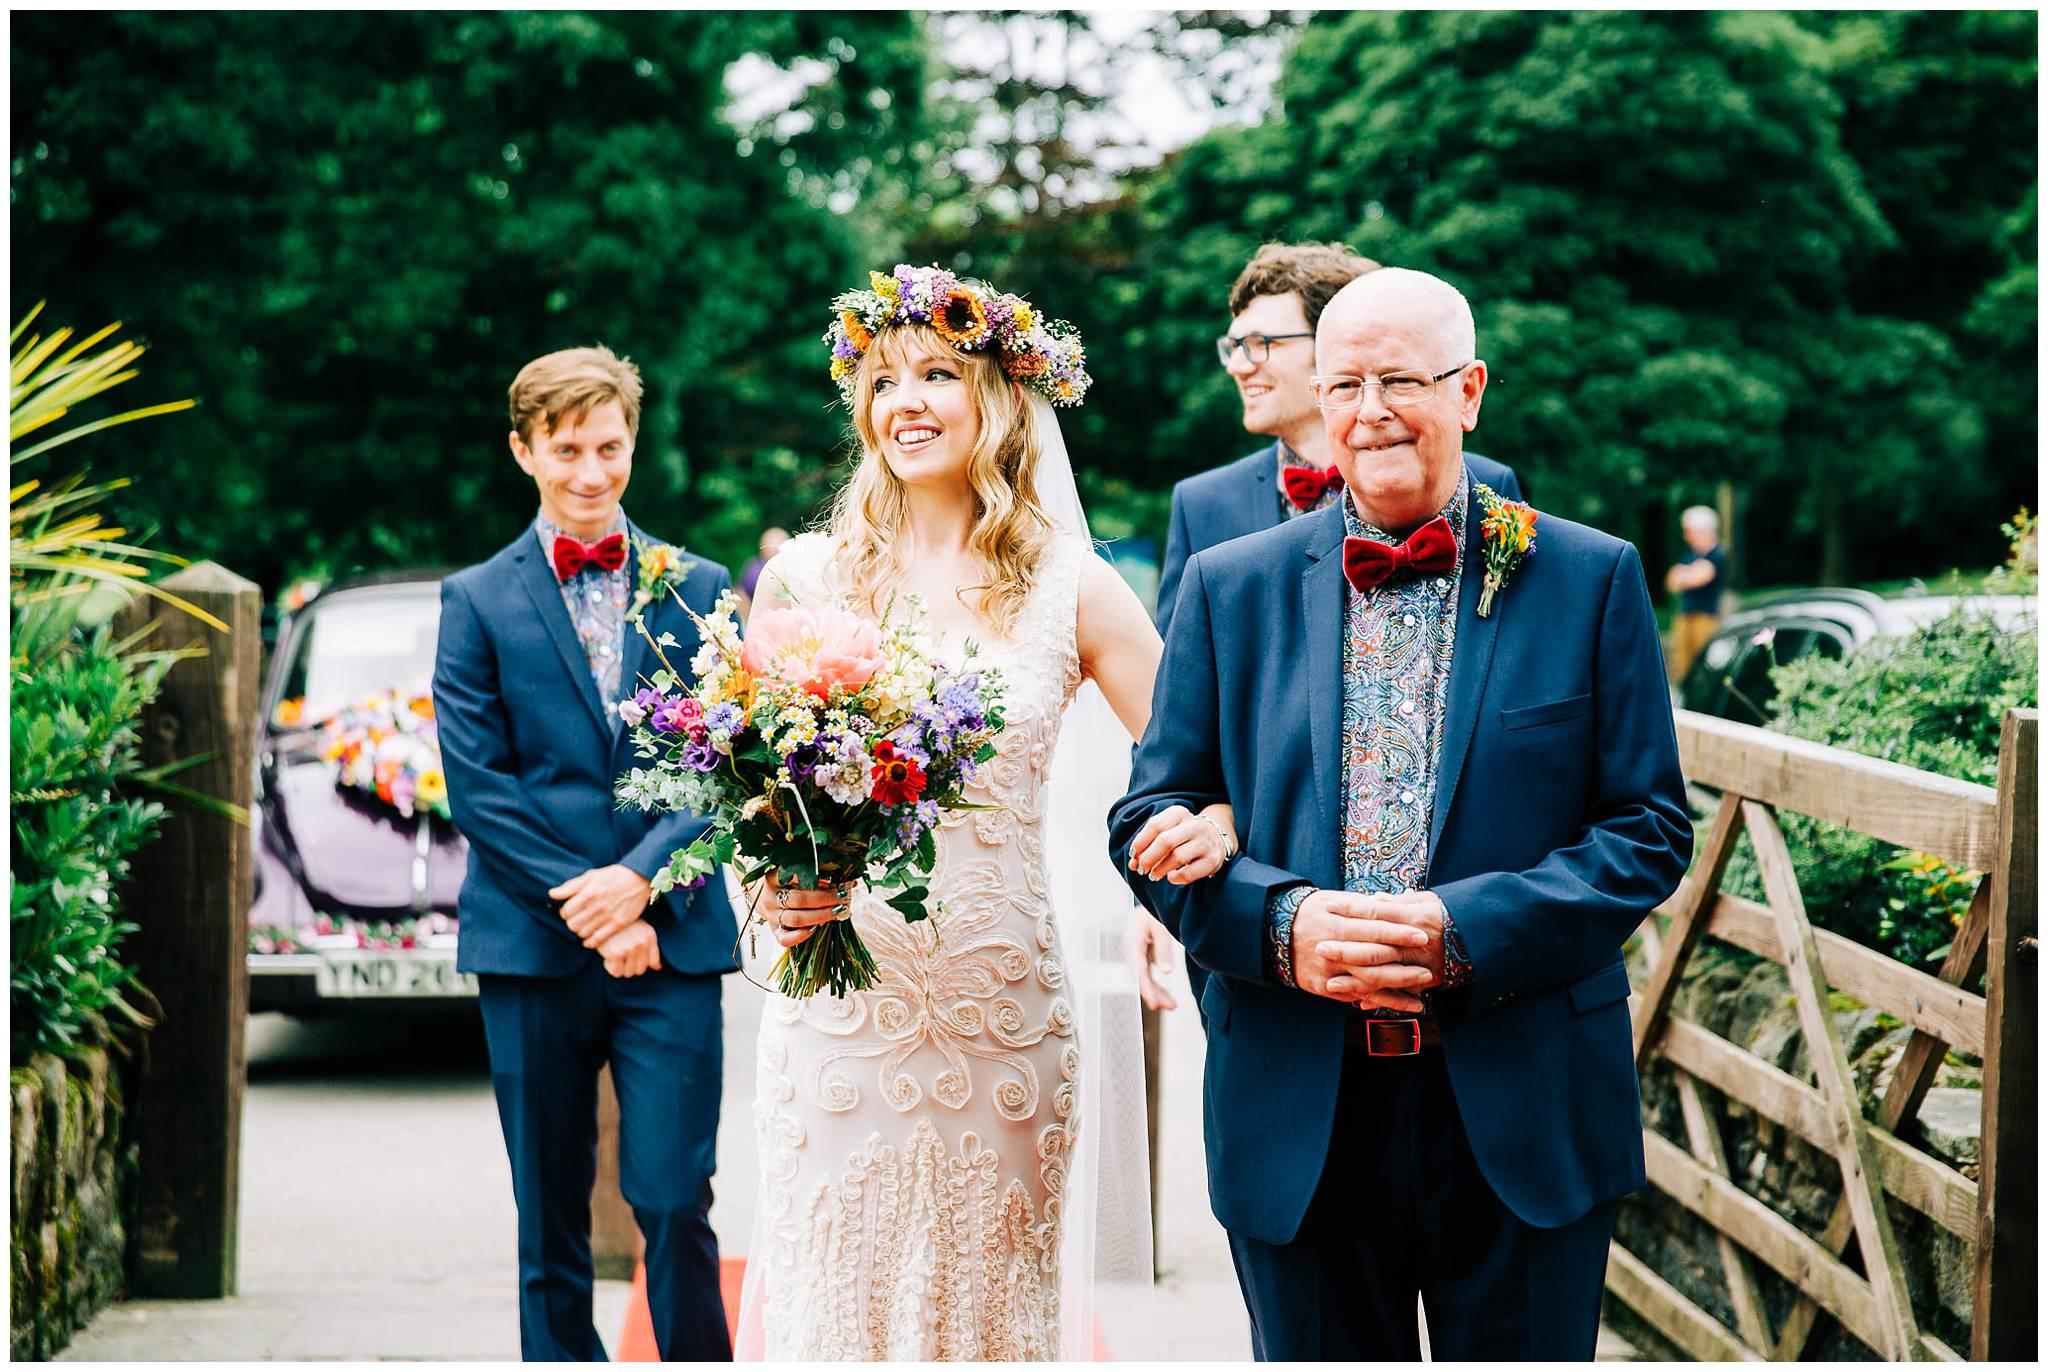 bride starting to walk down aisle smiling